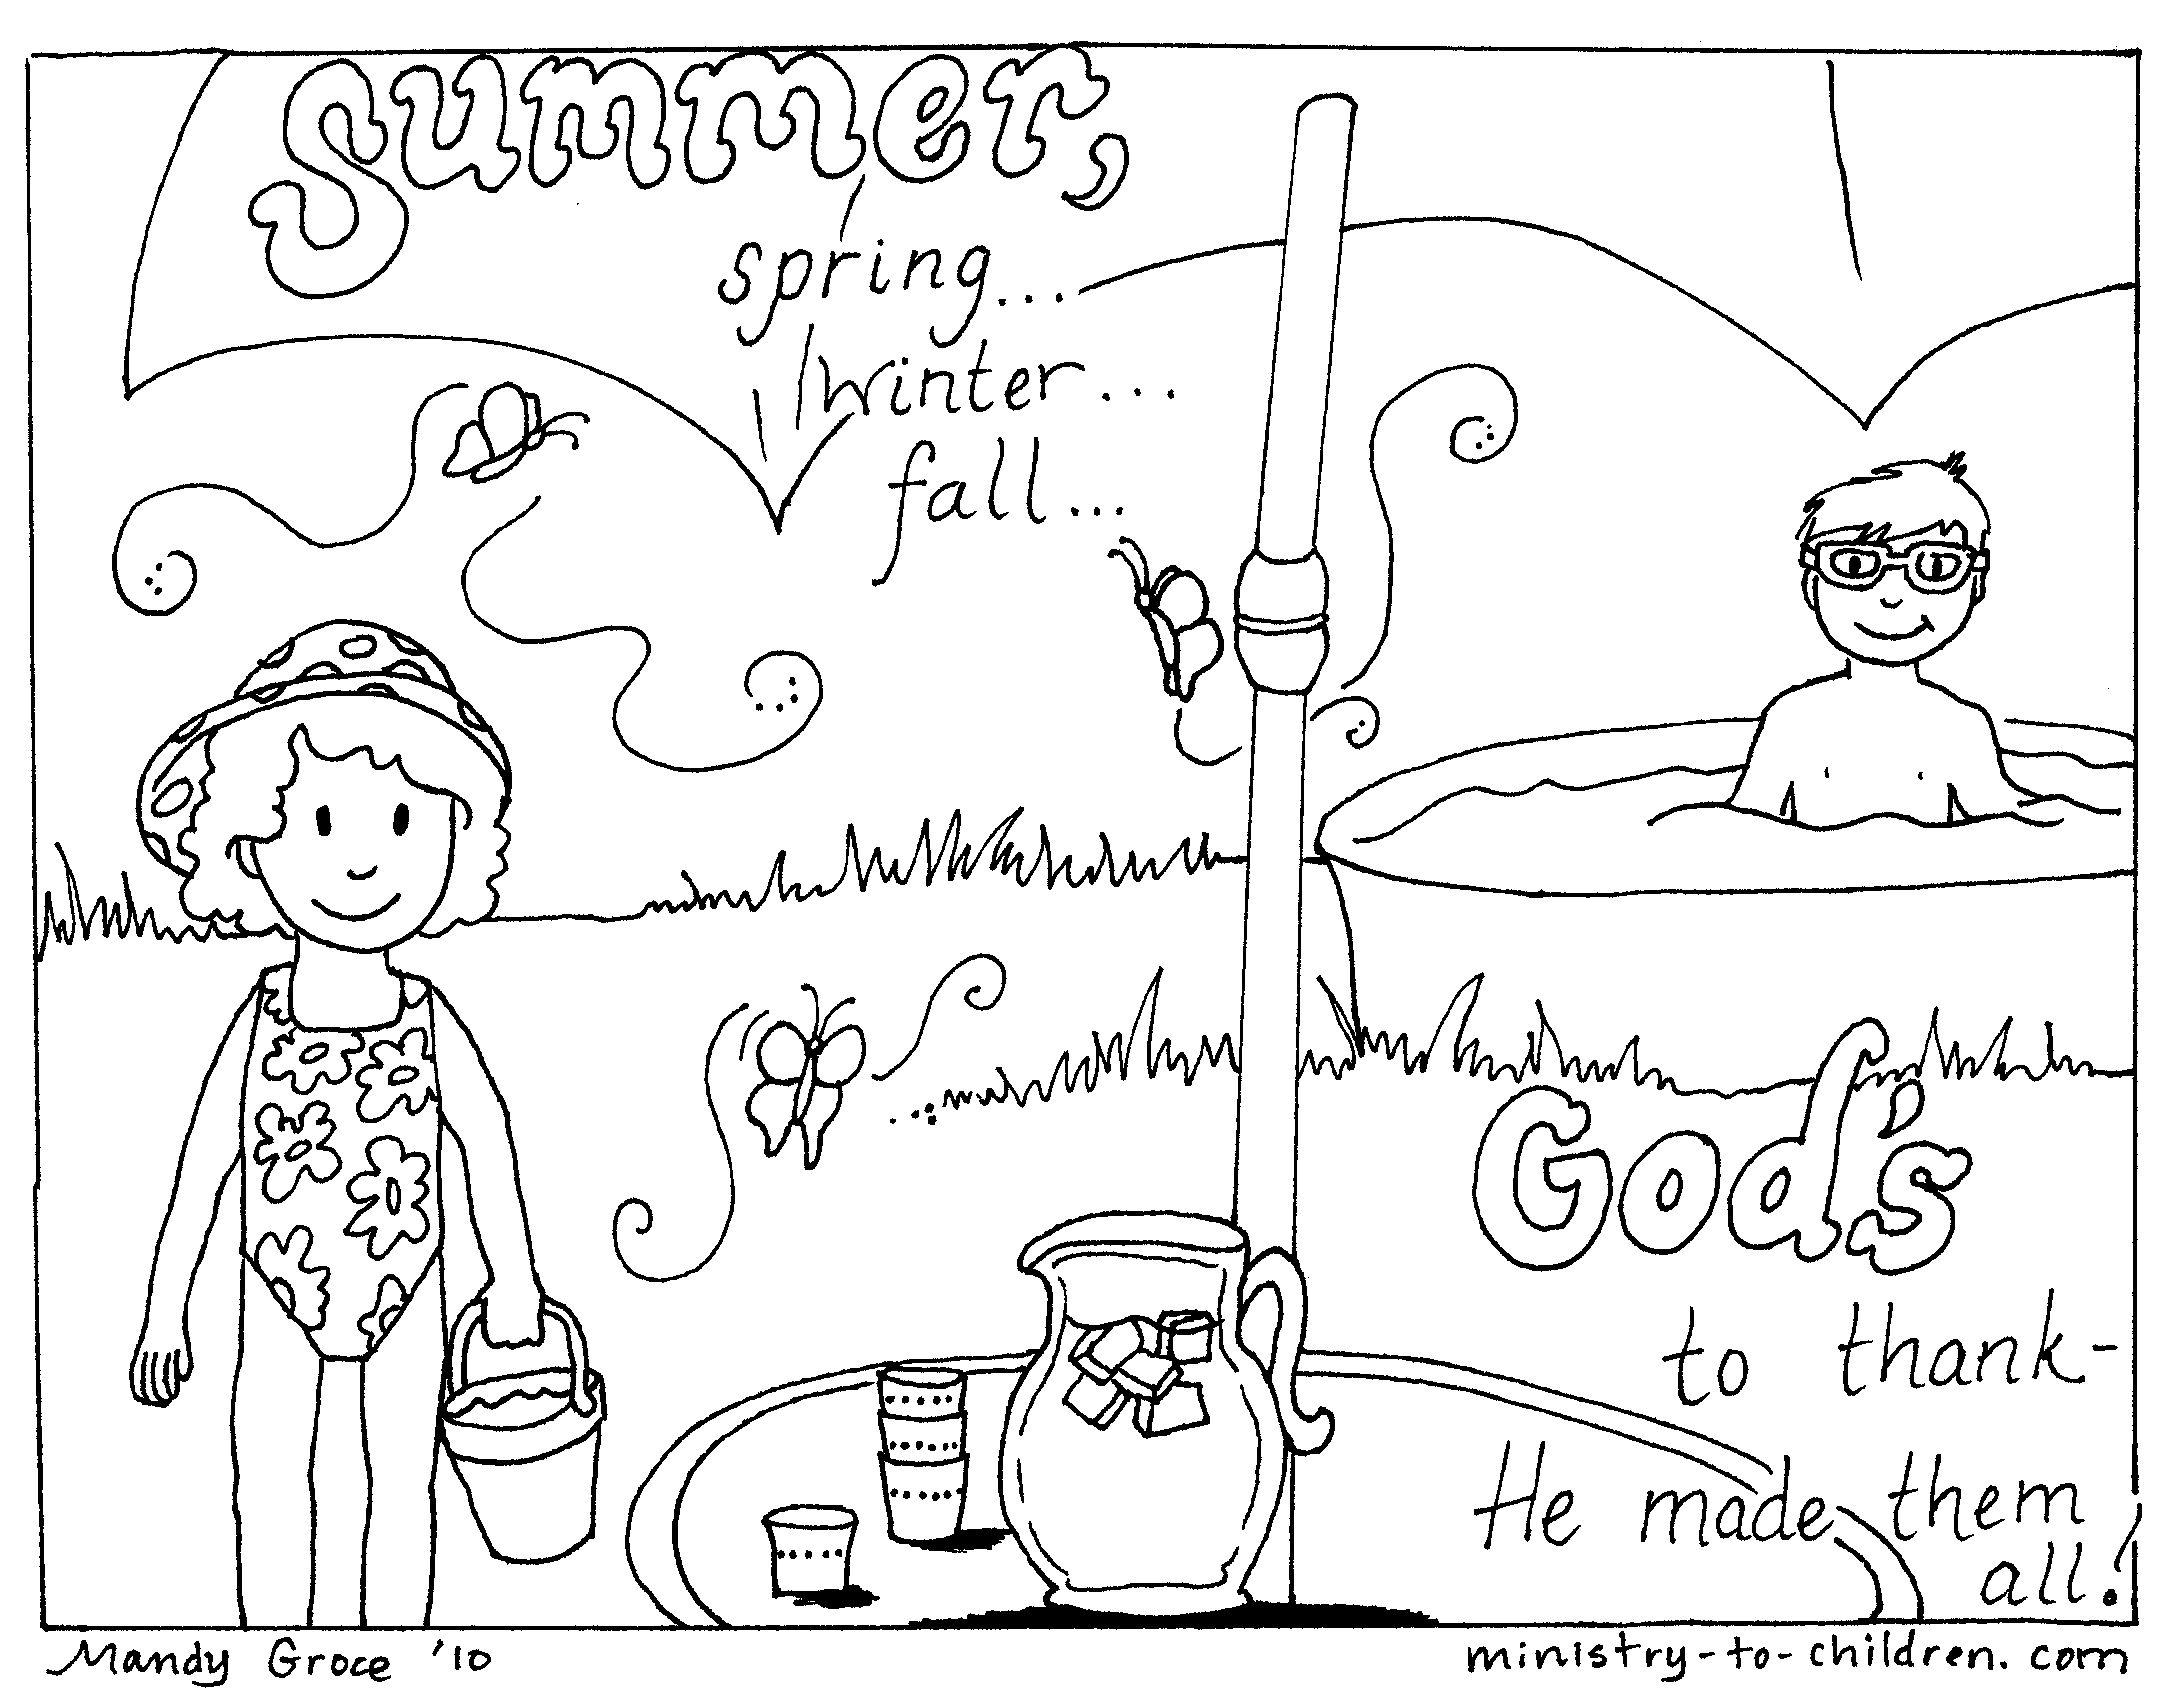 Summer Coloring Page Summer Coloring Pages Summer Coloring Sheets Bible Coloring Pages